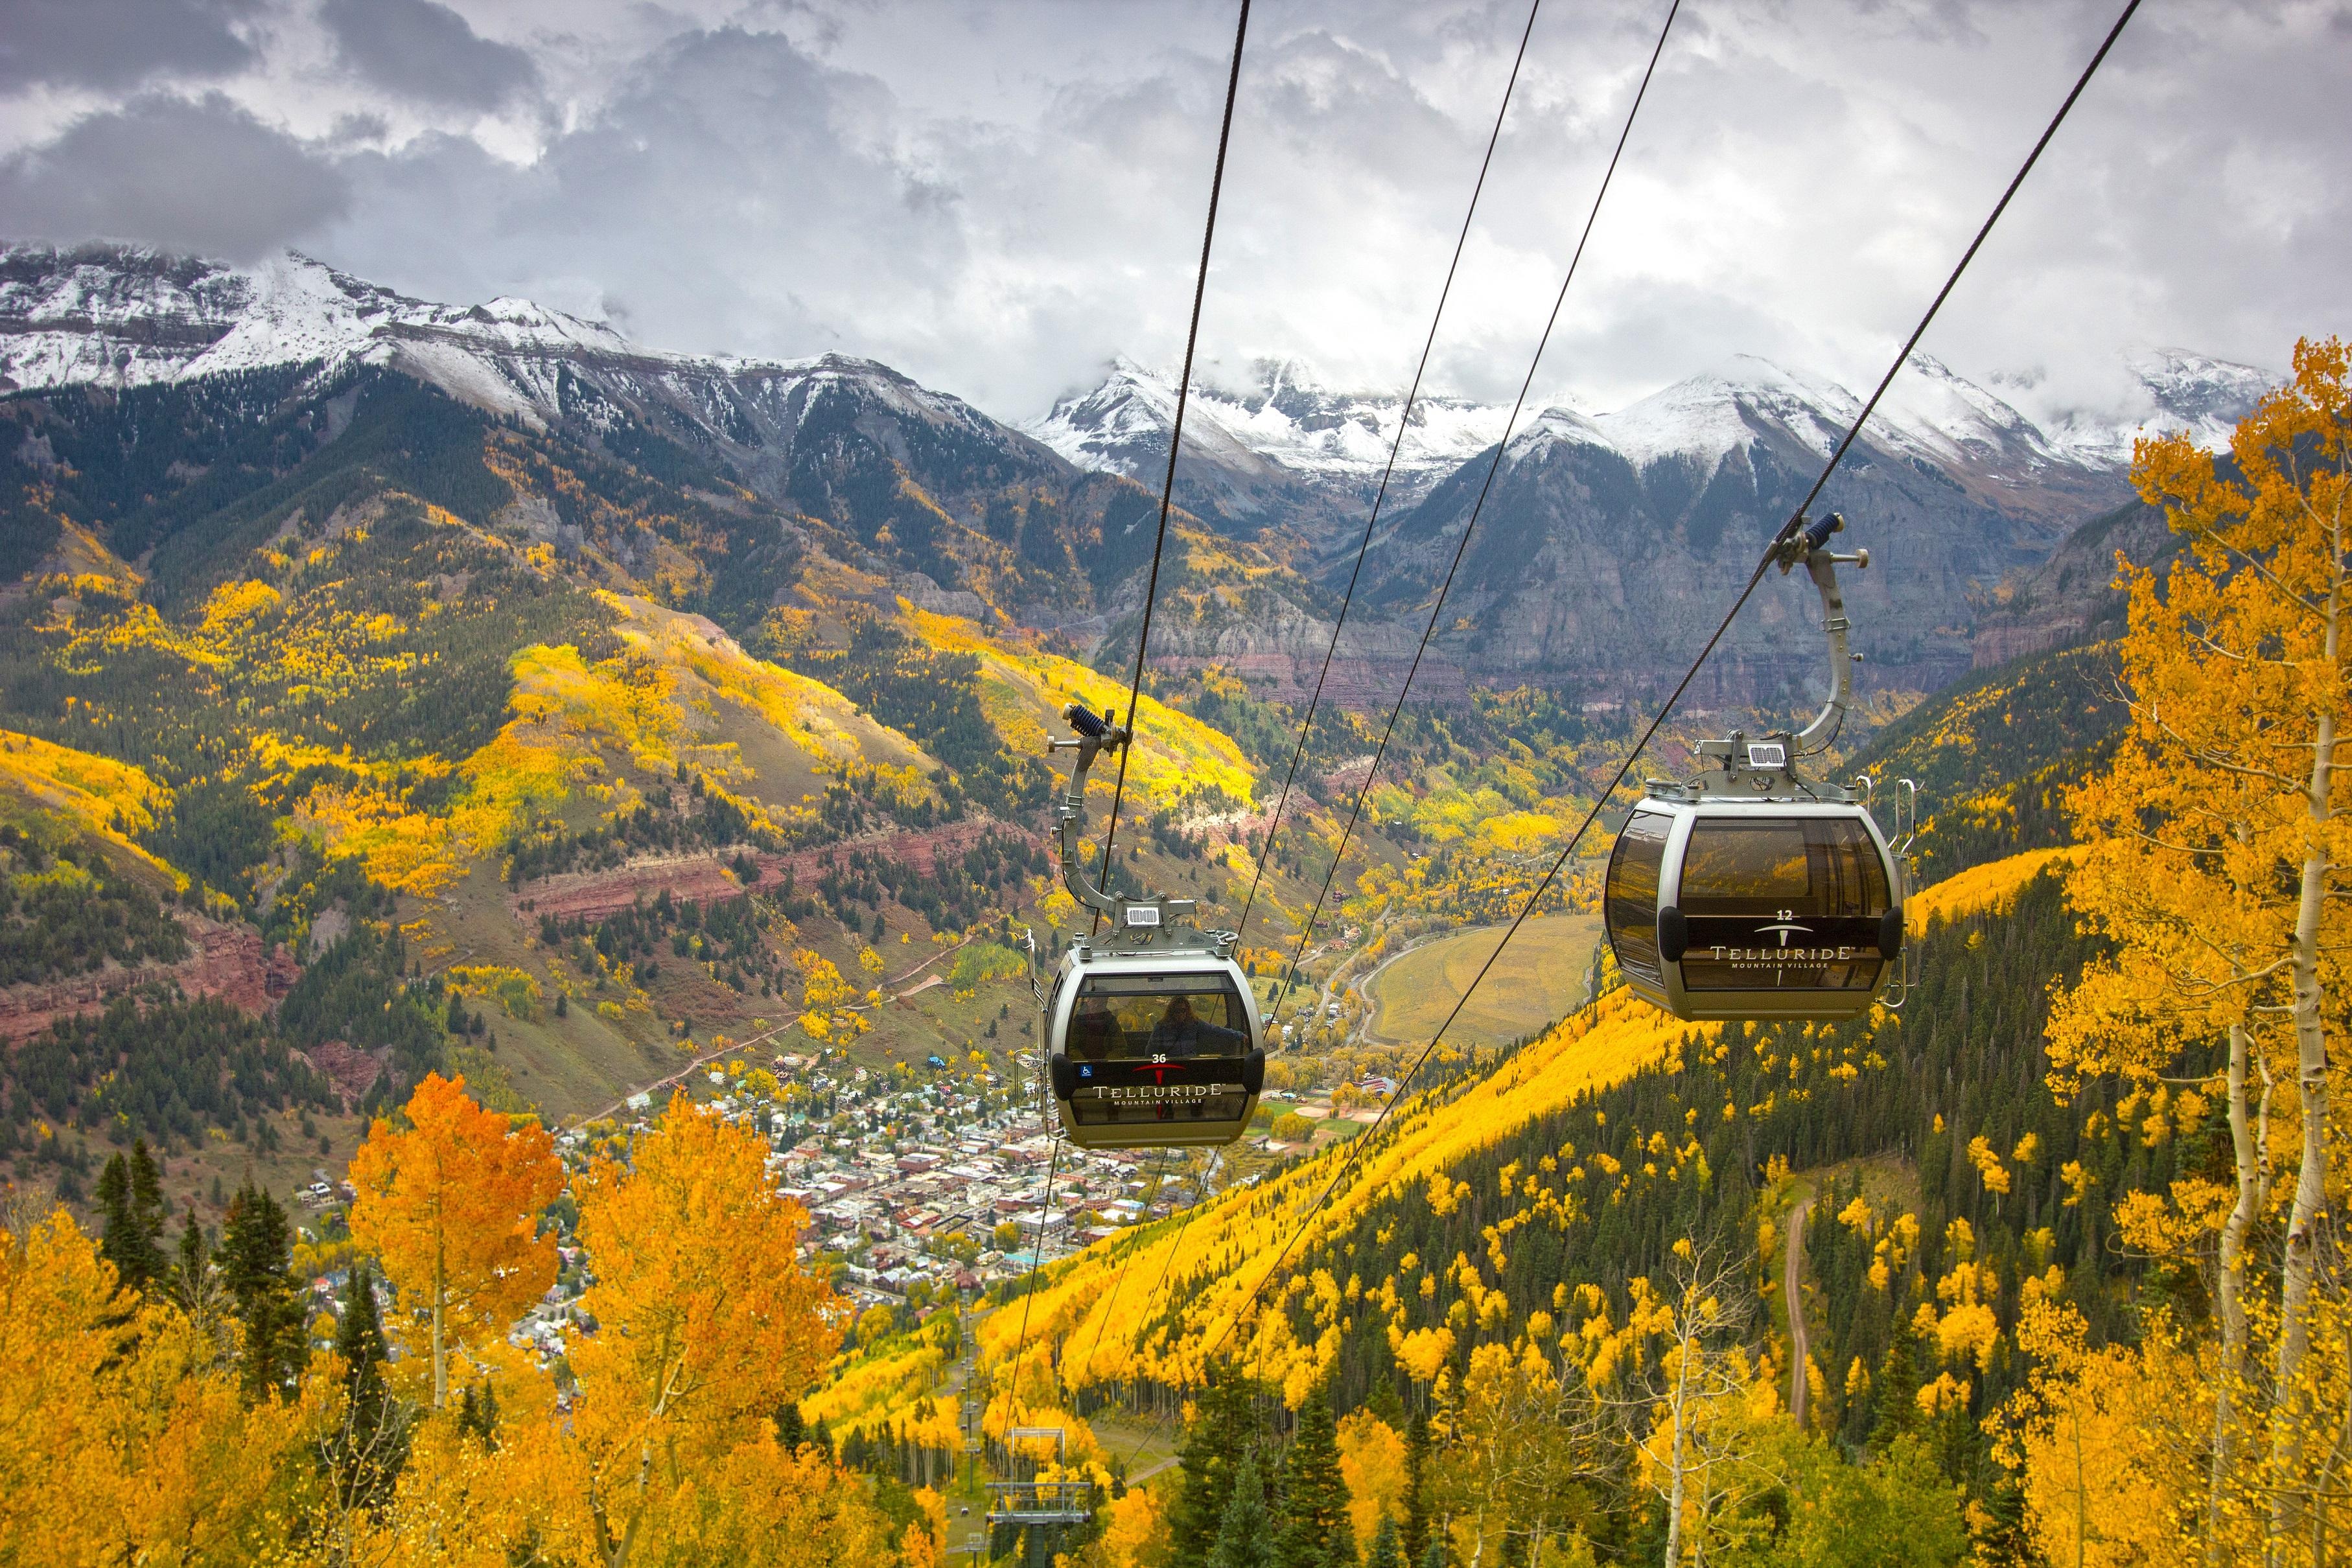 Telluride. Fall Gold Season with Gondolas